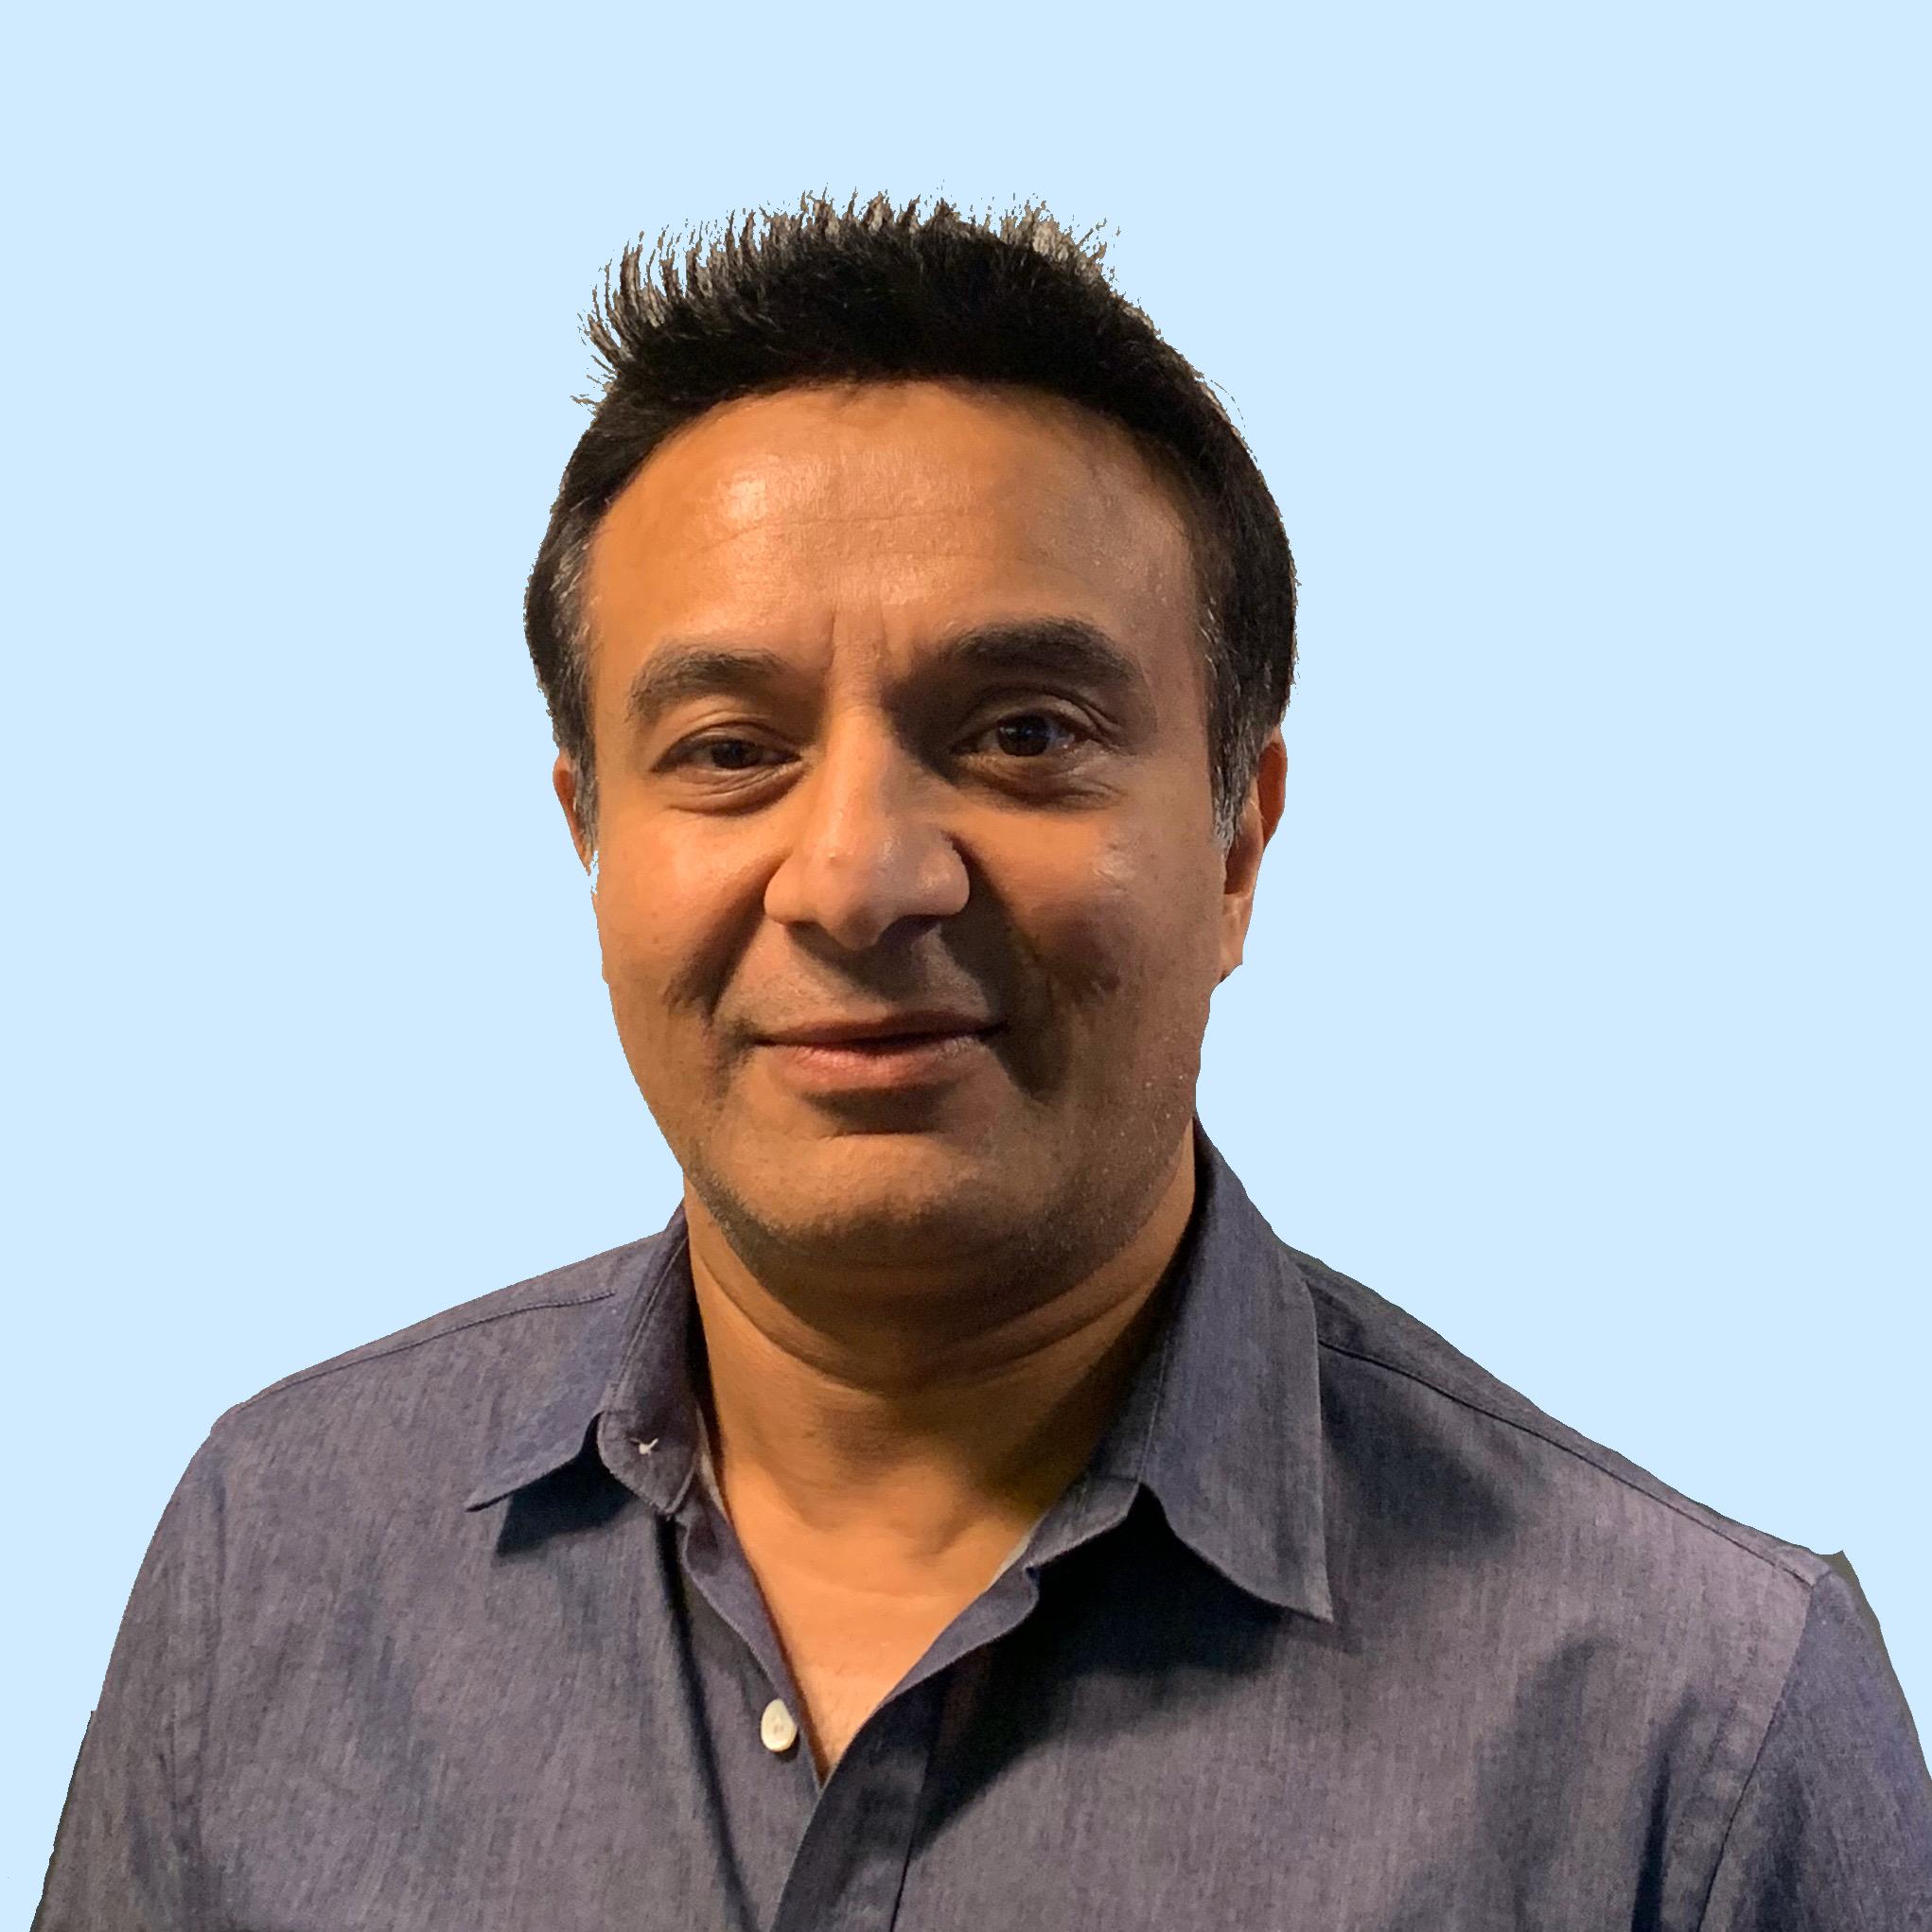 Sandeep Patel - Chief Executive Officer